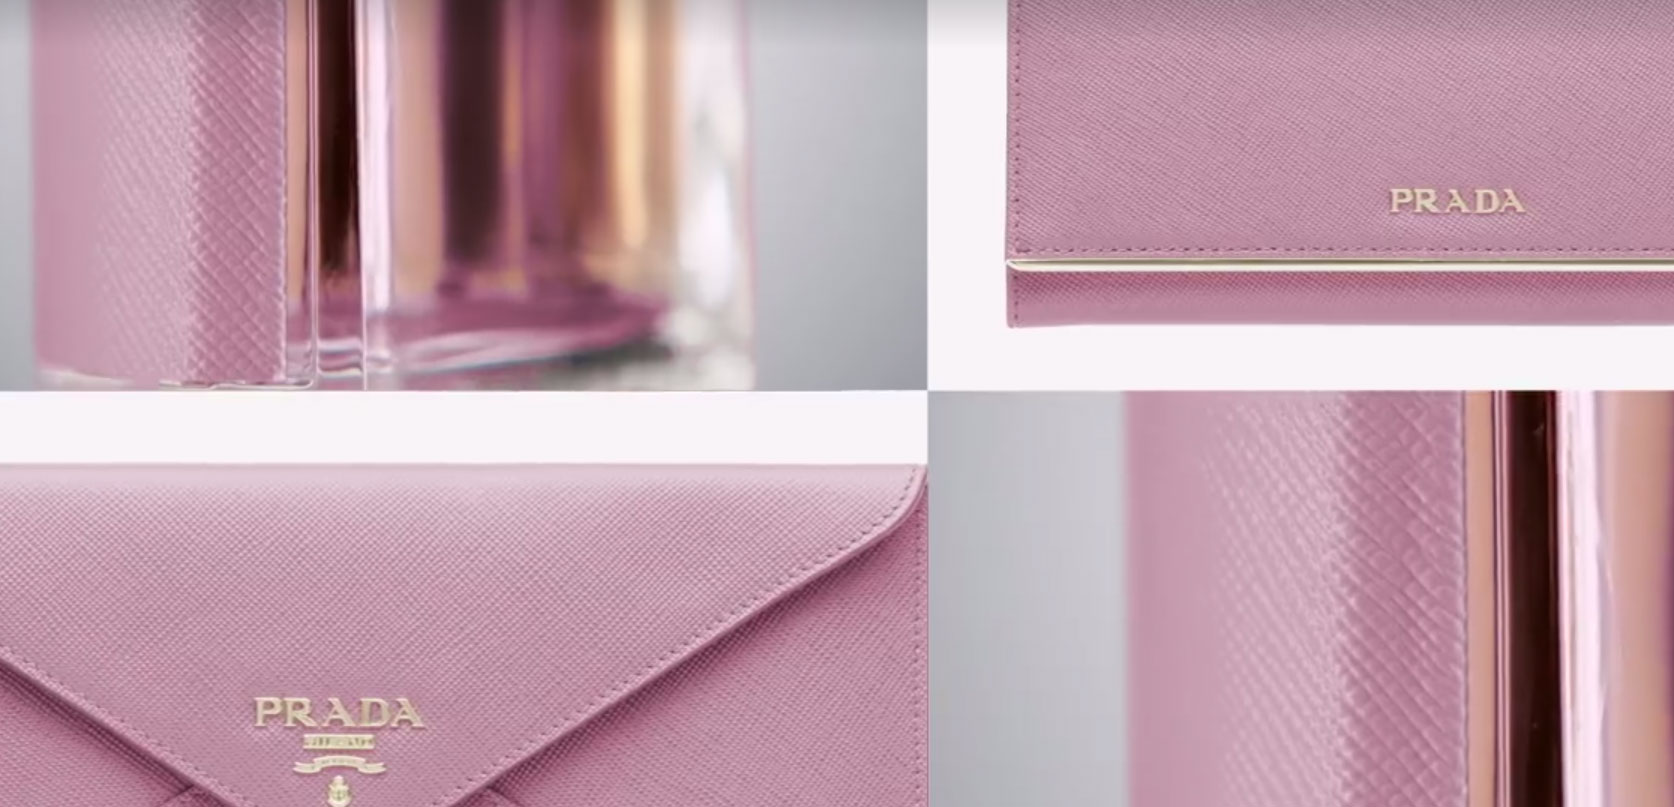 1b0bce5cb2132b Prada - La Femme Prada L Eau   L Homme Prada L Eau ~ New Fragrances